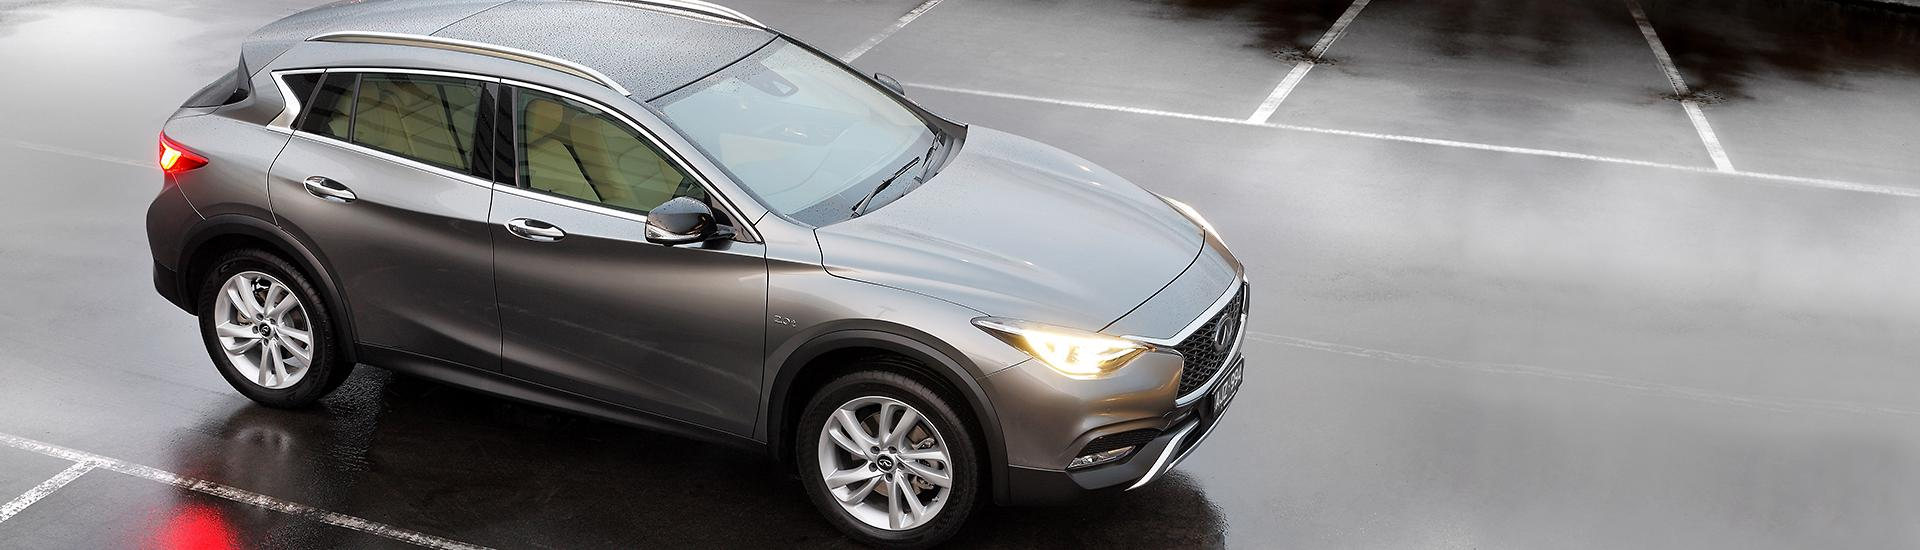 New Infiniti QX30 SUV Cars For Sale - carsales.com.au